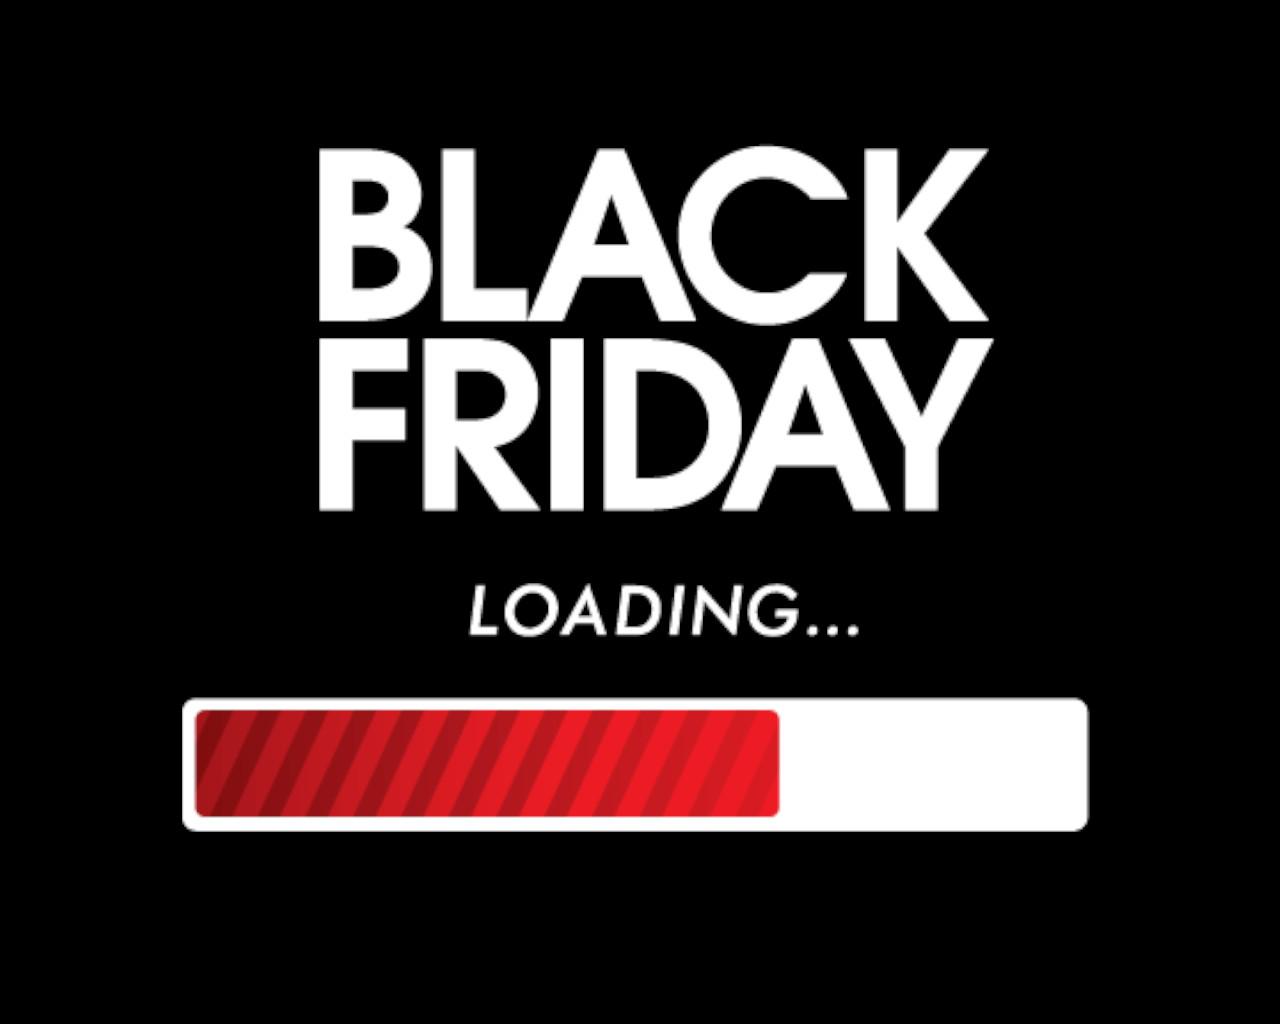 black friday ρουχα,black friday ρουχα θεσσαλονικη,black friday ρουχα,black friday ρουχα γυναικεια,black friday ρουχα εγκυμοσυνησ,black friday ρουχα μεγαλα μεγεθη,black friday ρουχα 2019,black friday ρουχα ζαρα,black friday αθλητικα ρουχα,black friday ρουχα h&m